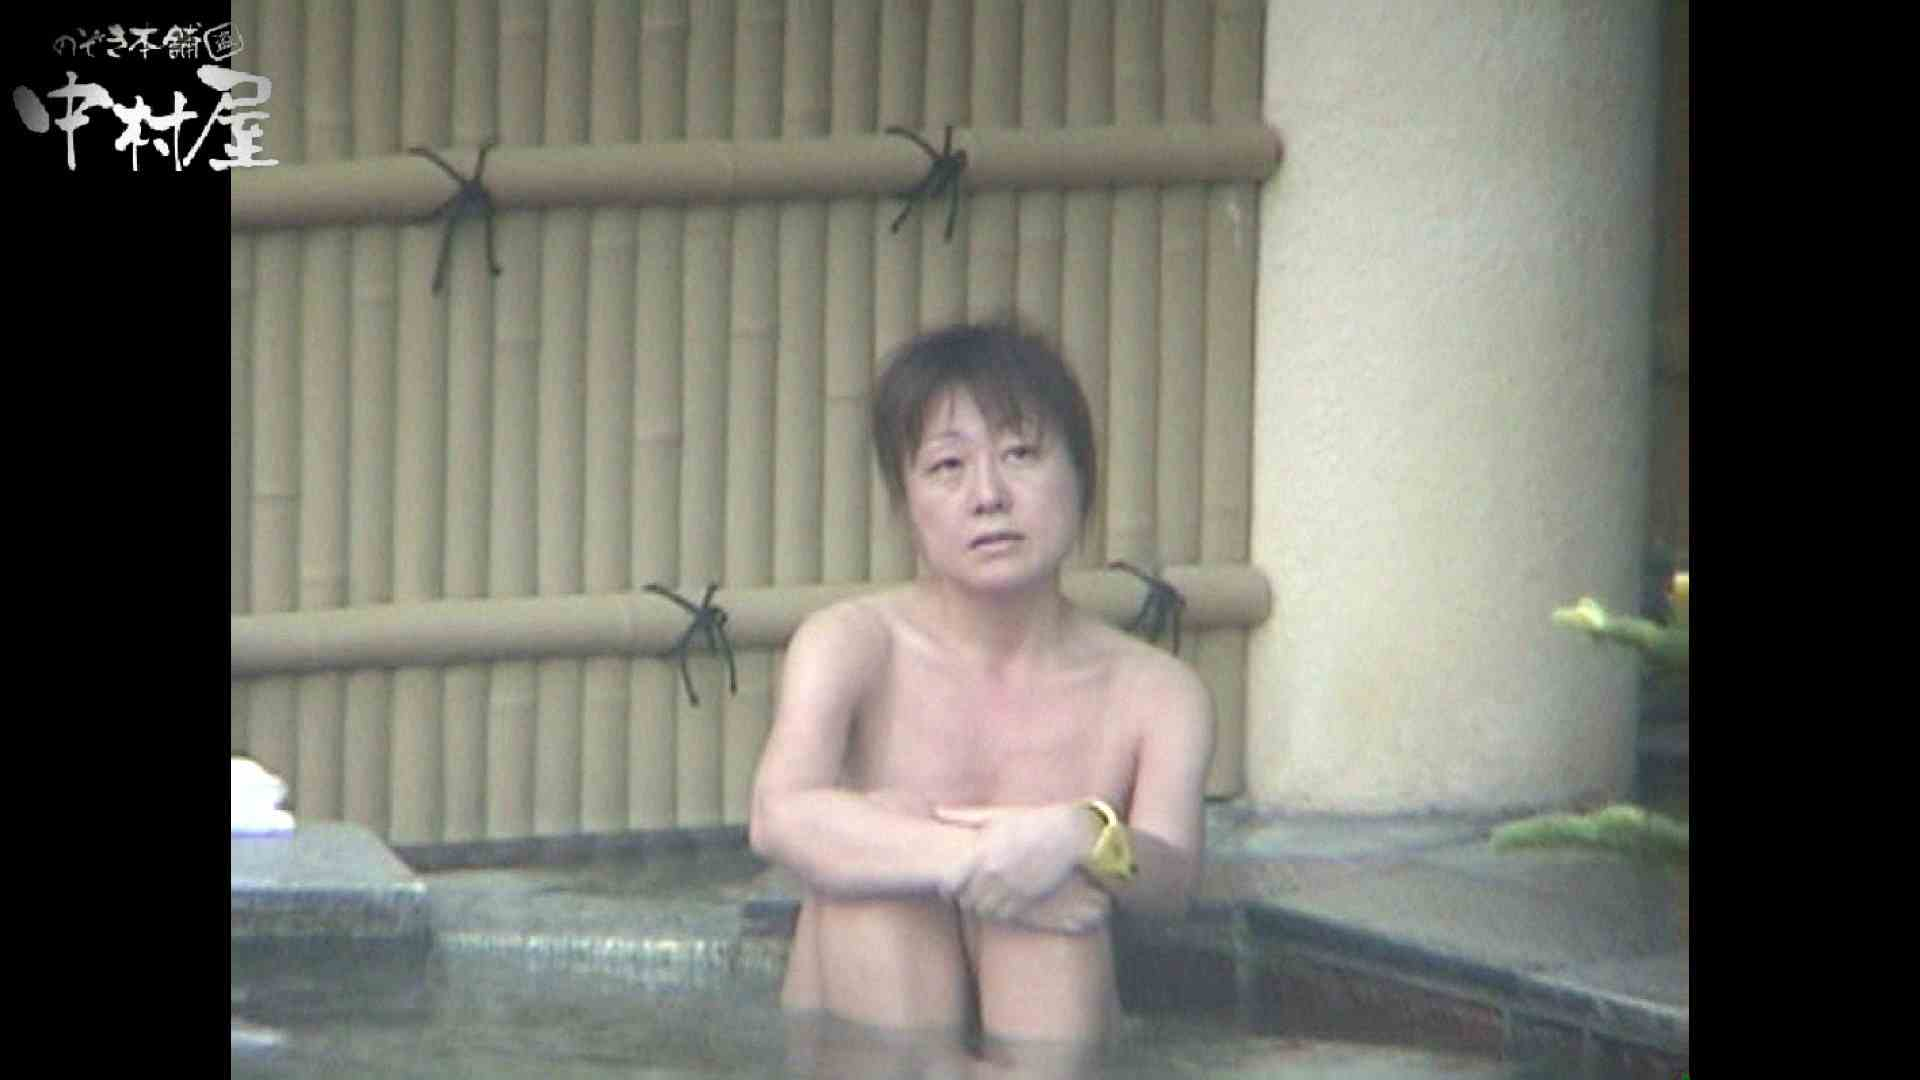 Aquaな露天風呂Vol.958 0  40連発 16